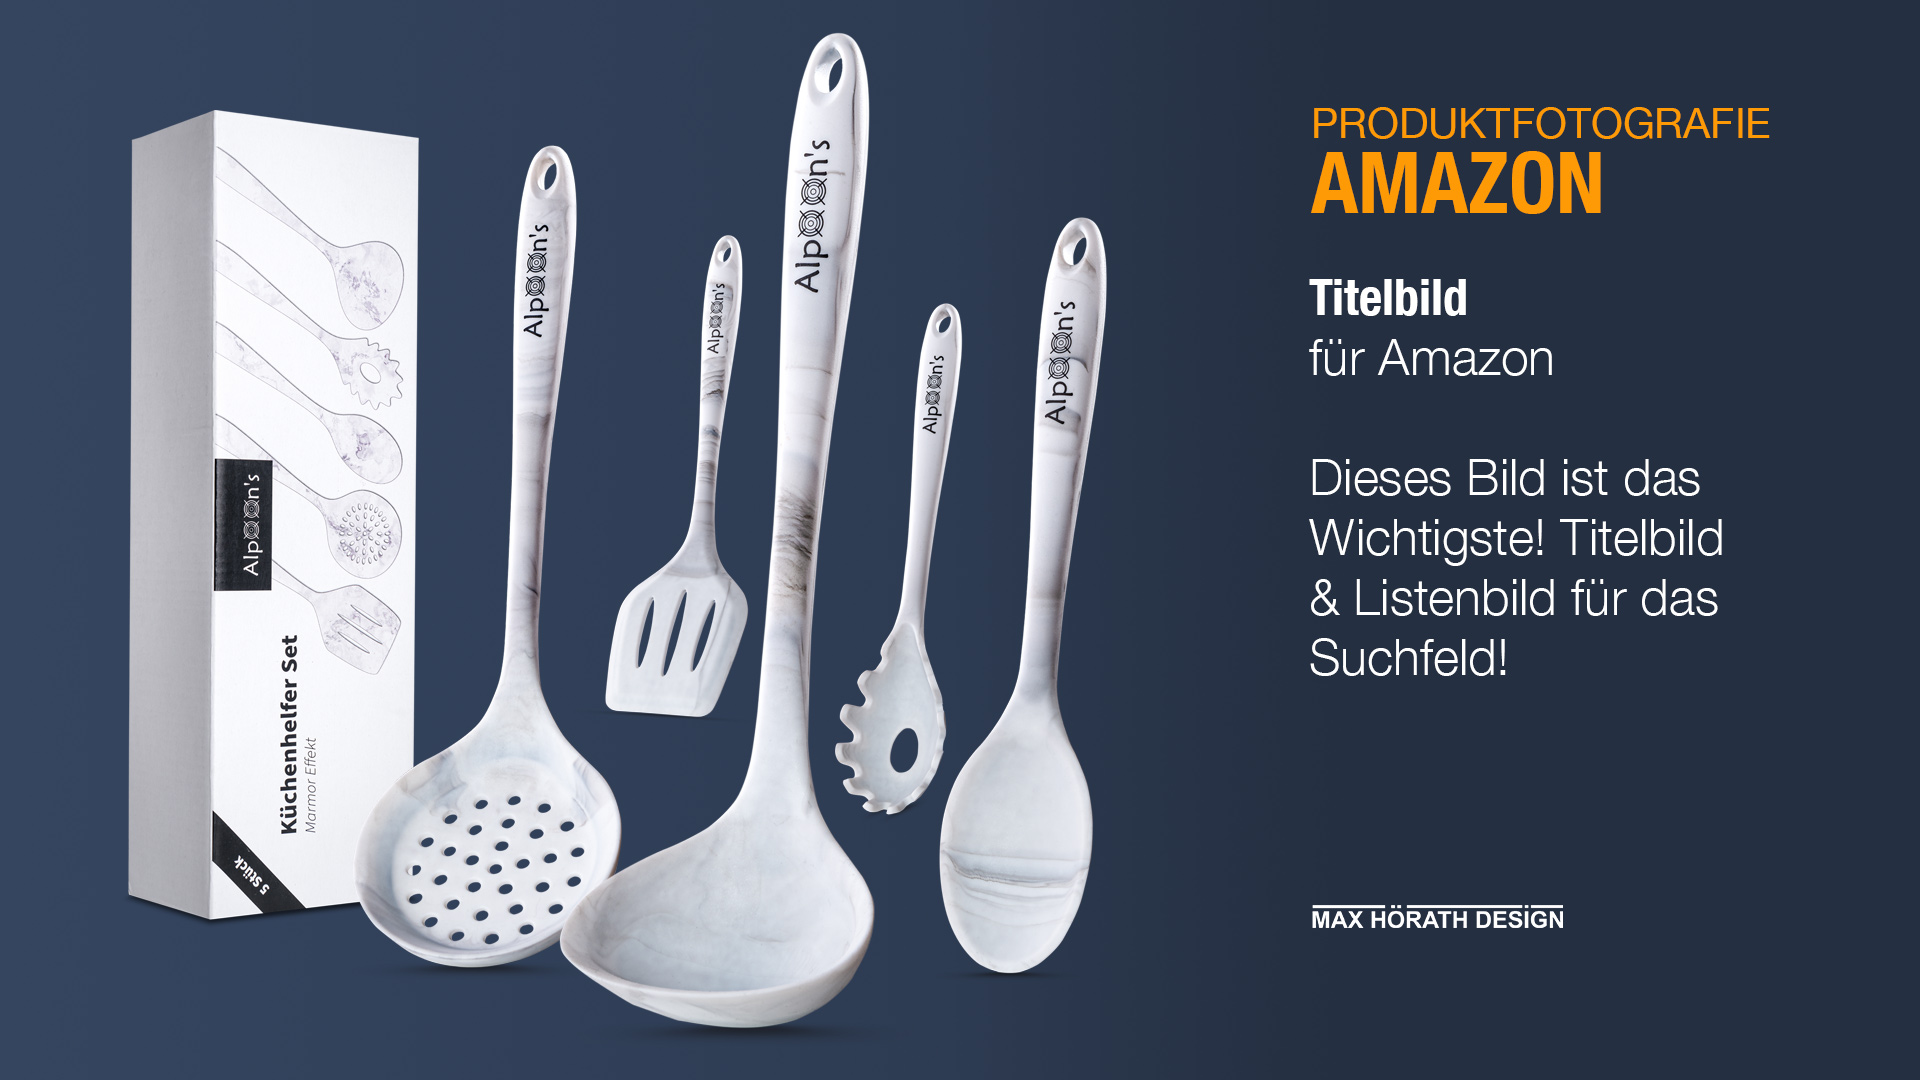 Produktfotografie - Amazon - Max Hörath Design